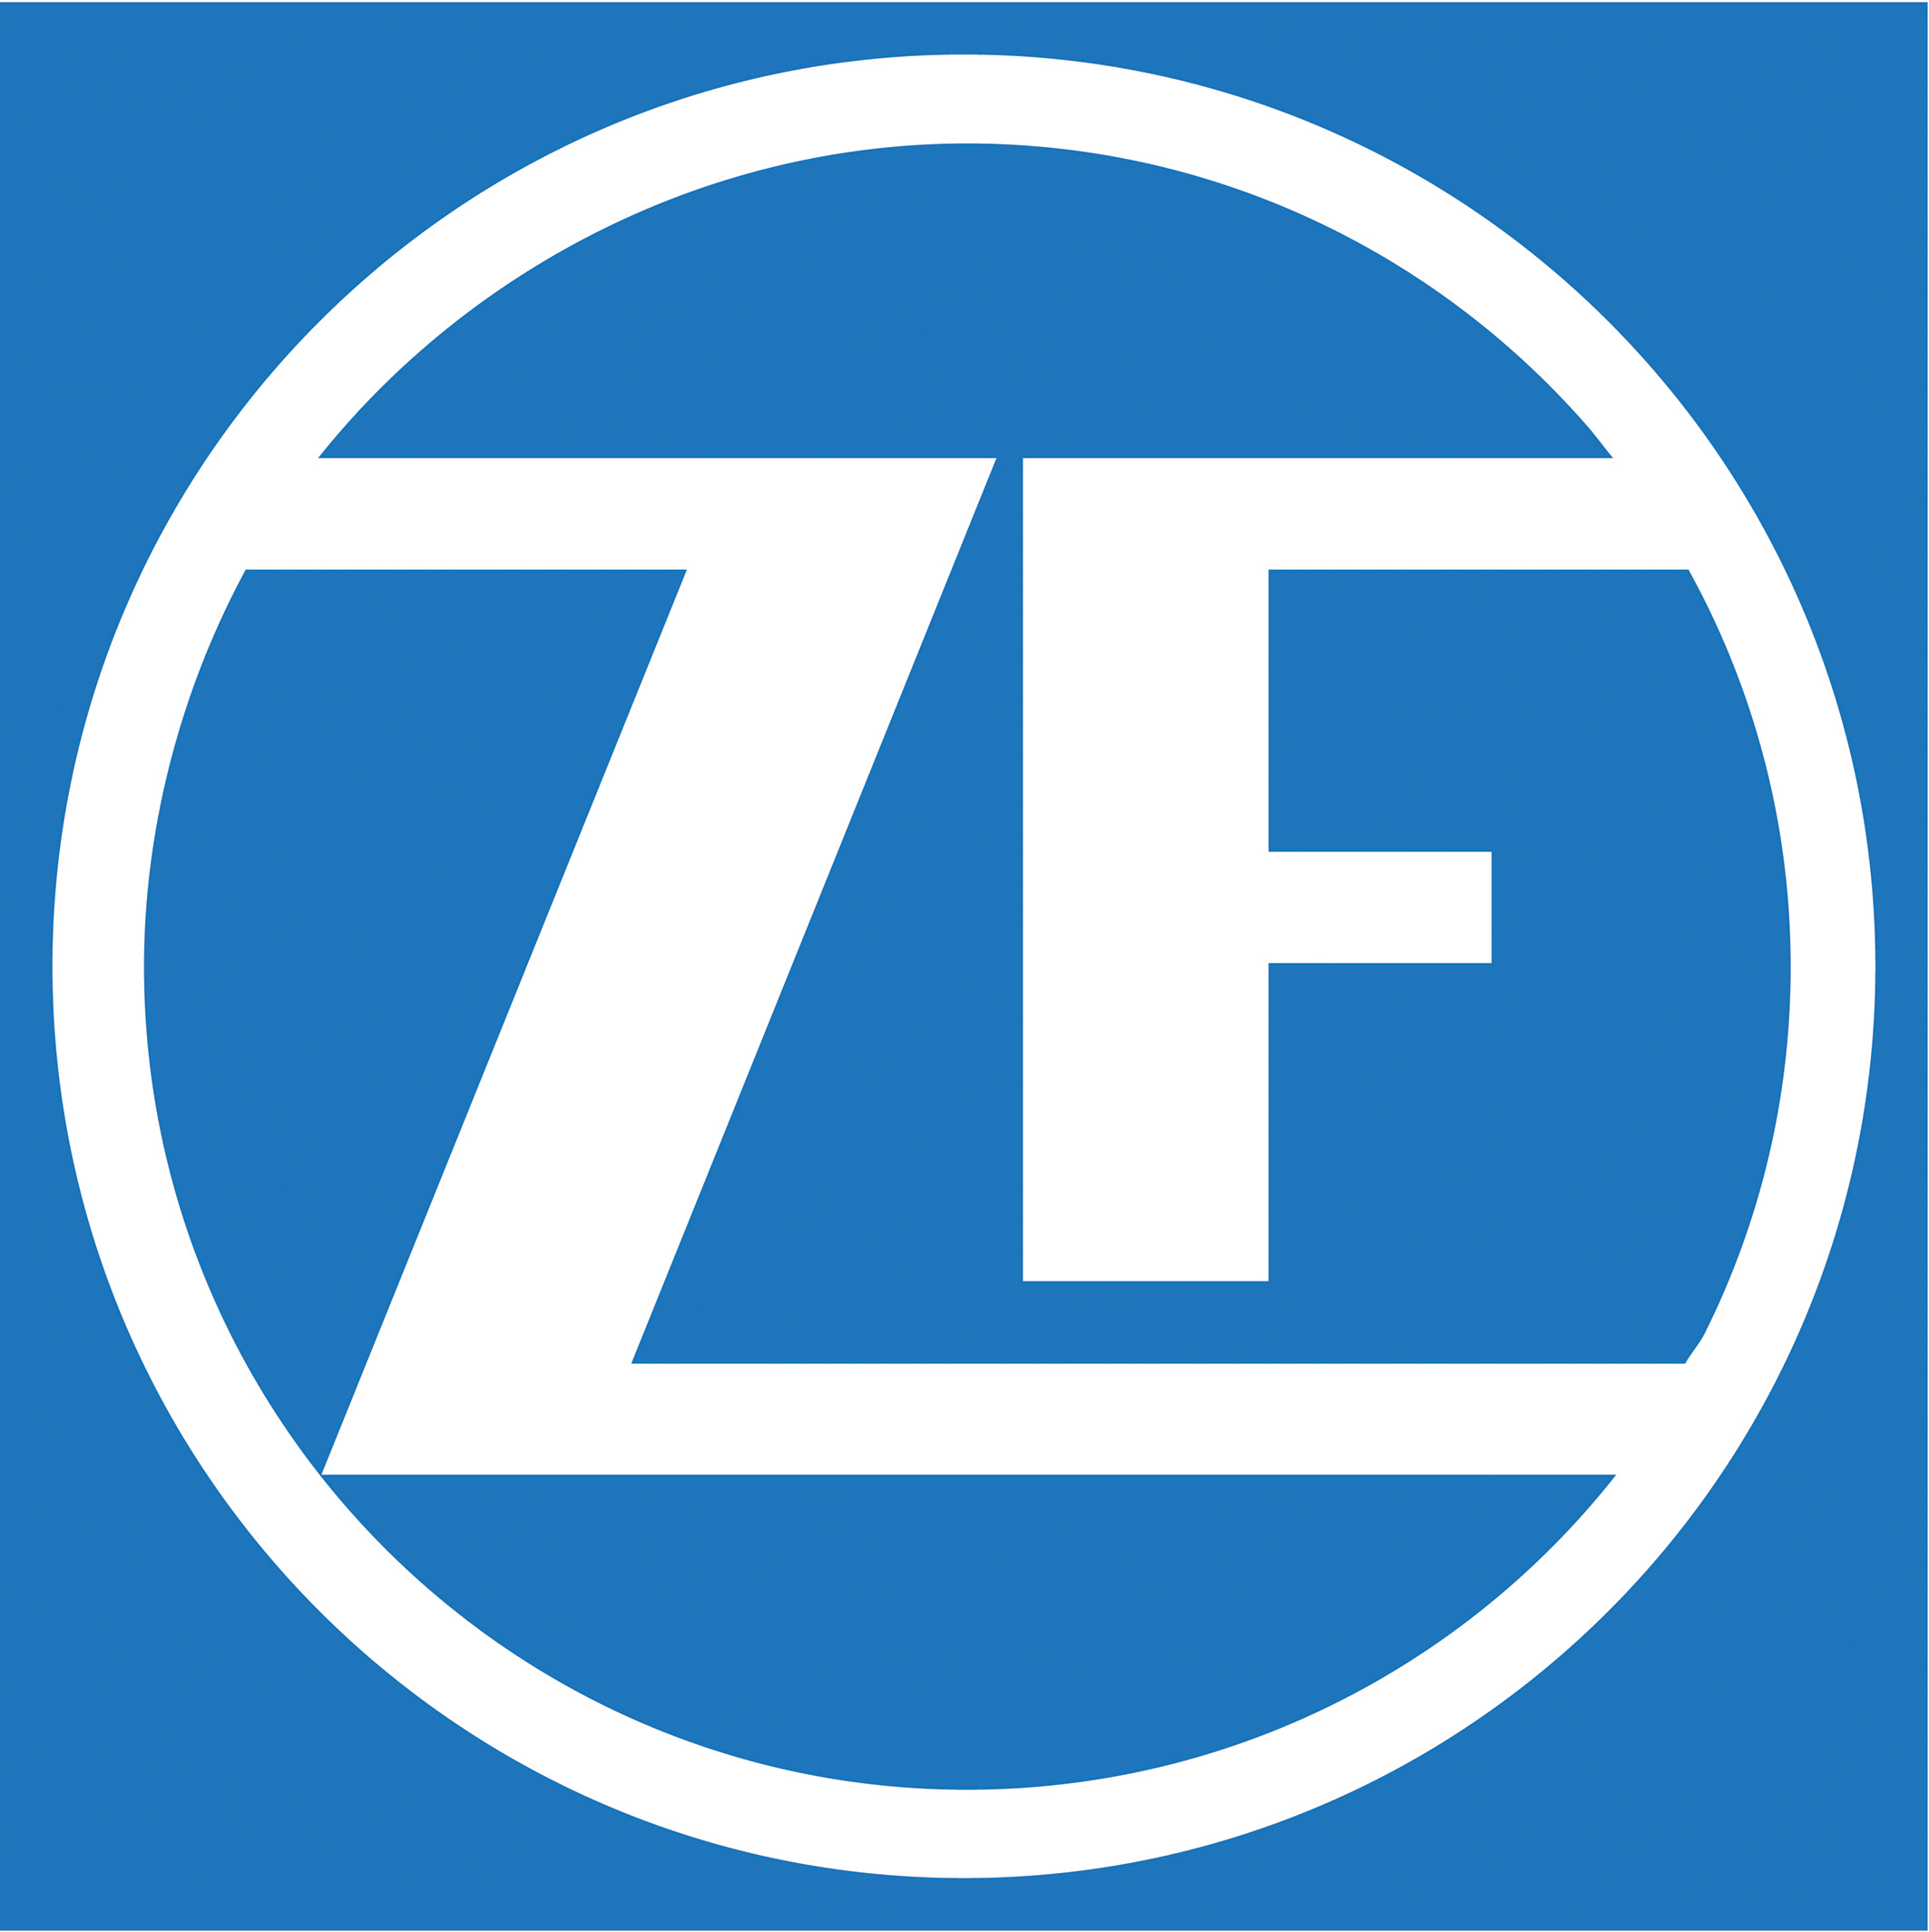 services_company_logo_zf_friedrichshafen_ag_zf